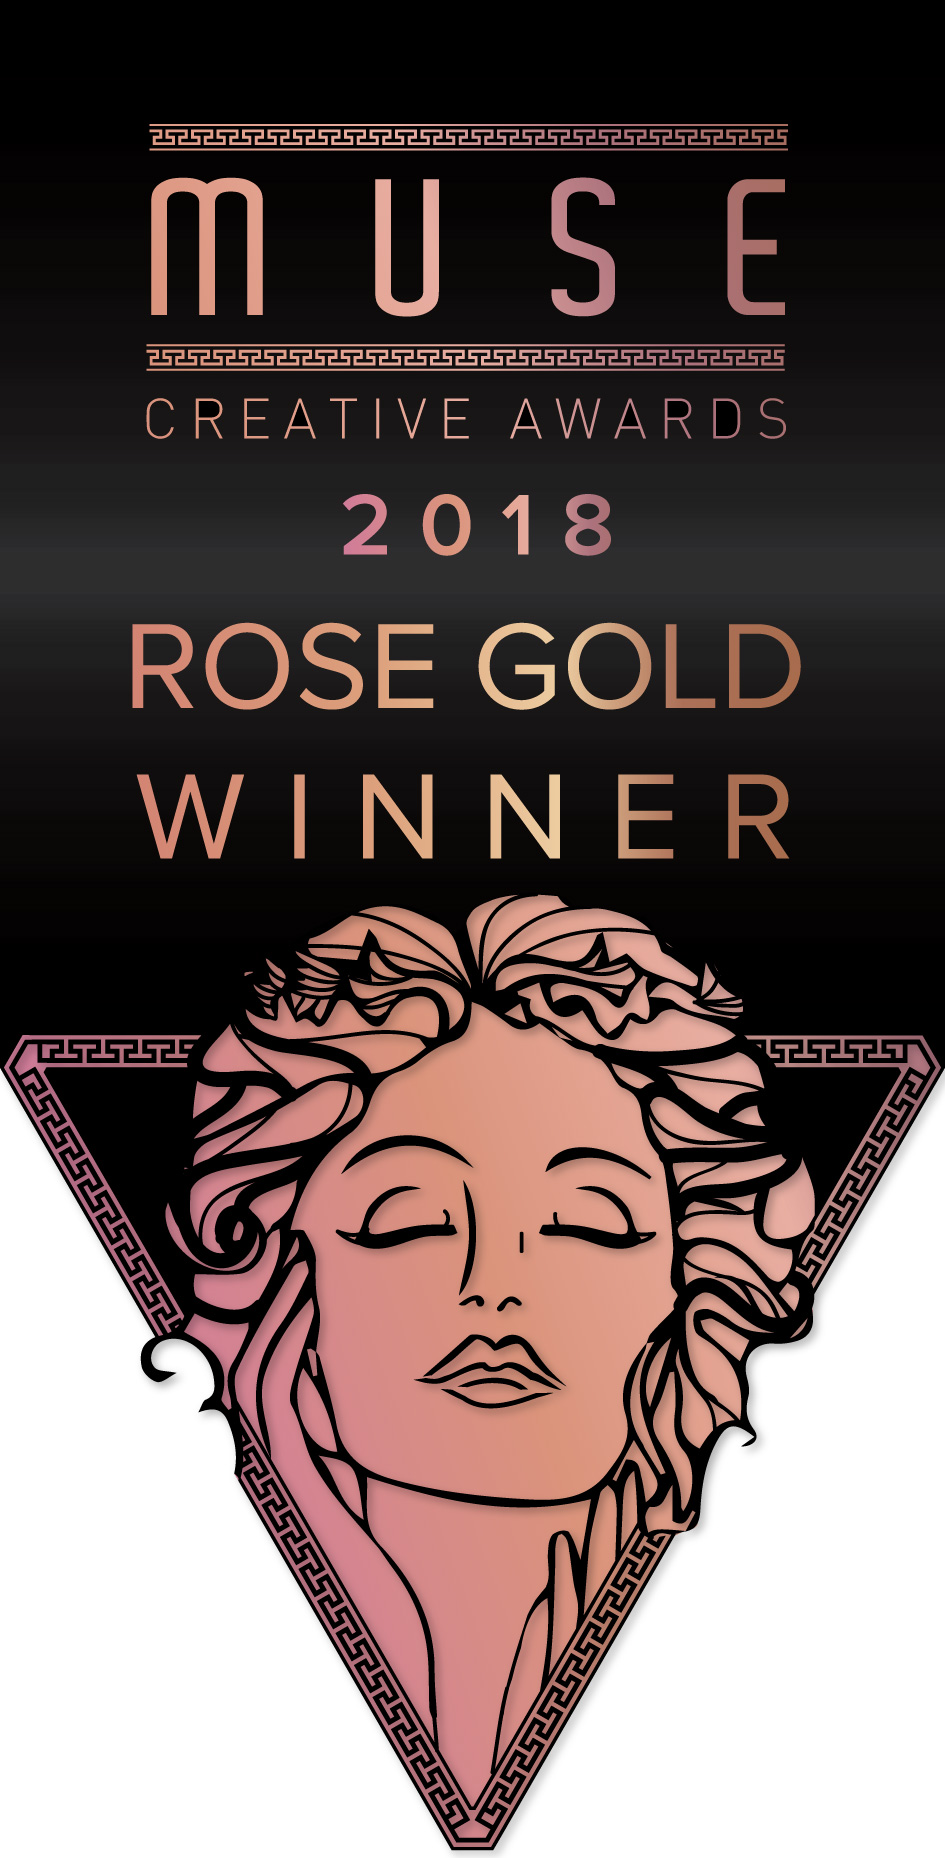 Award winning design, poster design and illustration